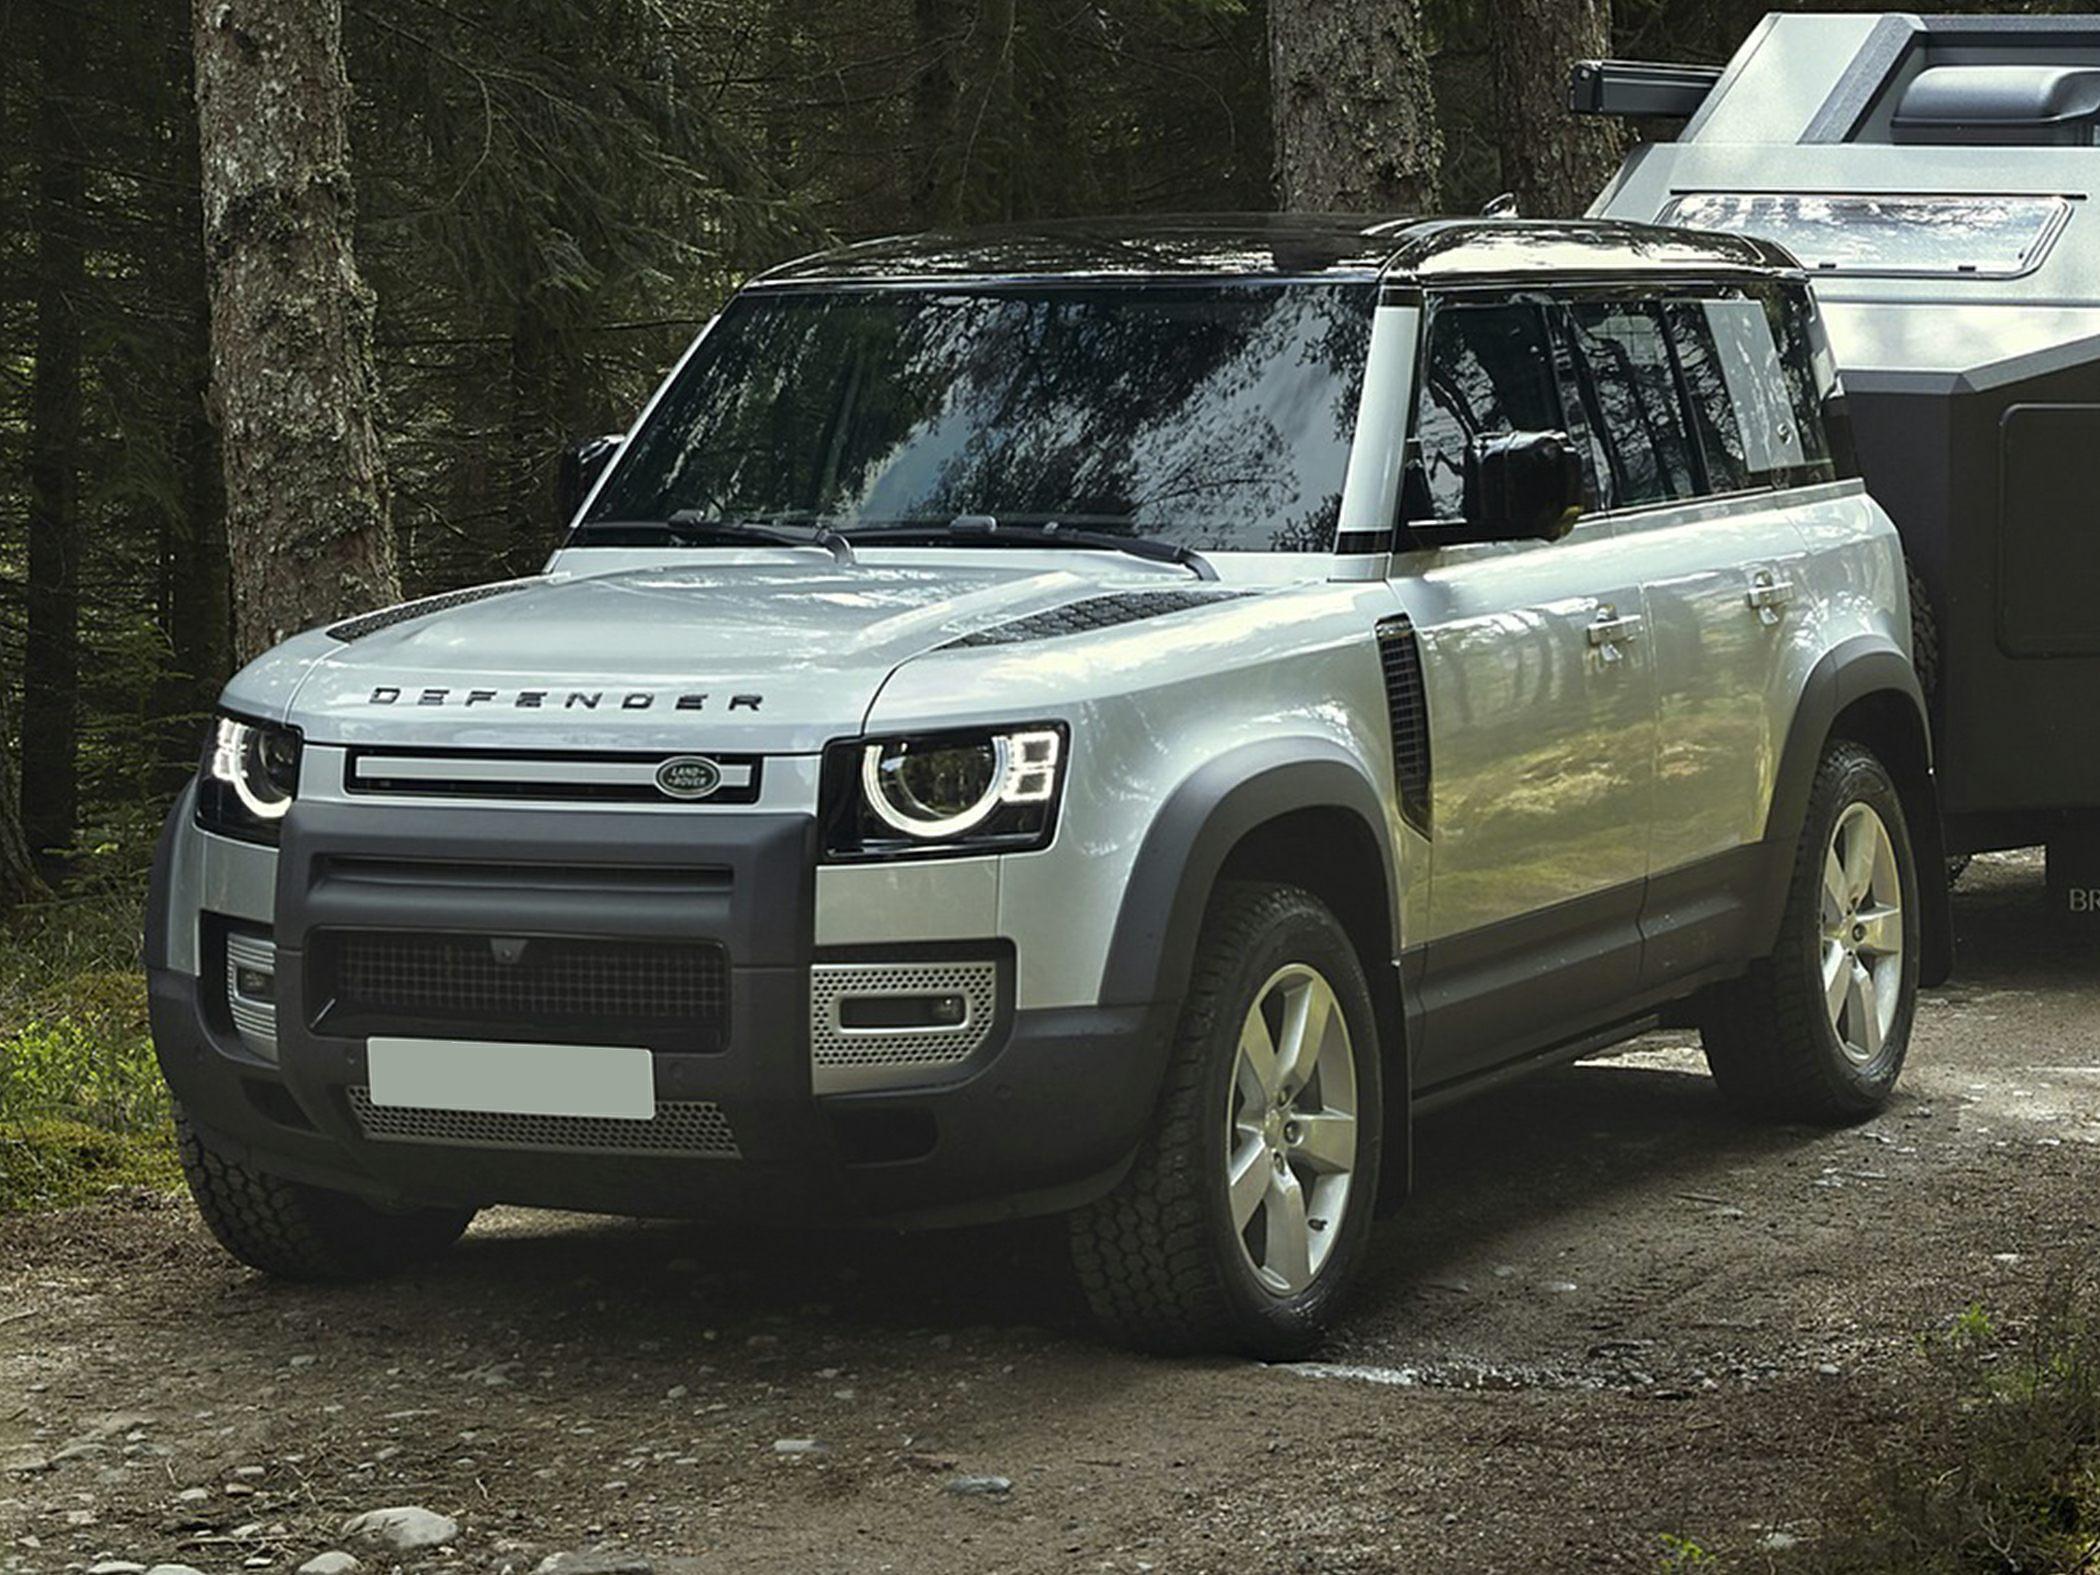 2021 Land Rover Defender PHEV, diesel six-cylinder ...